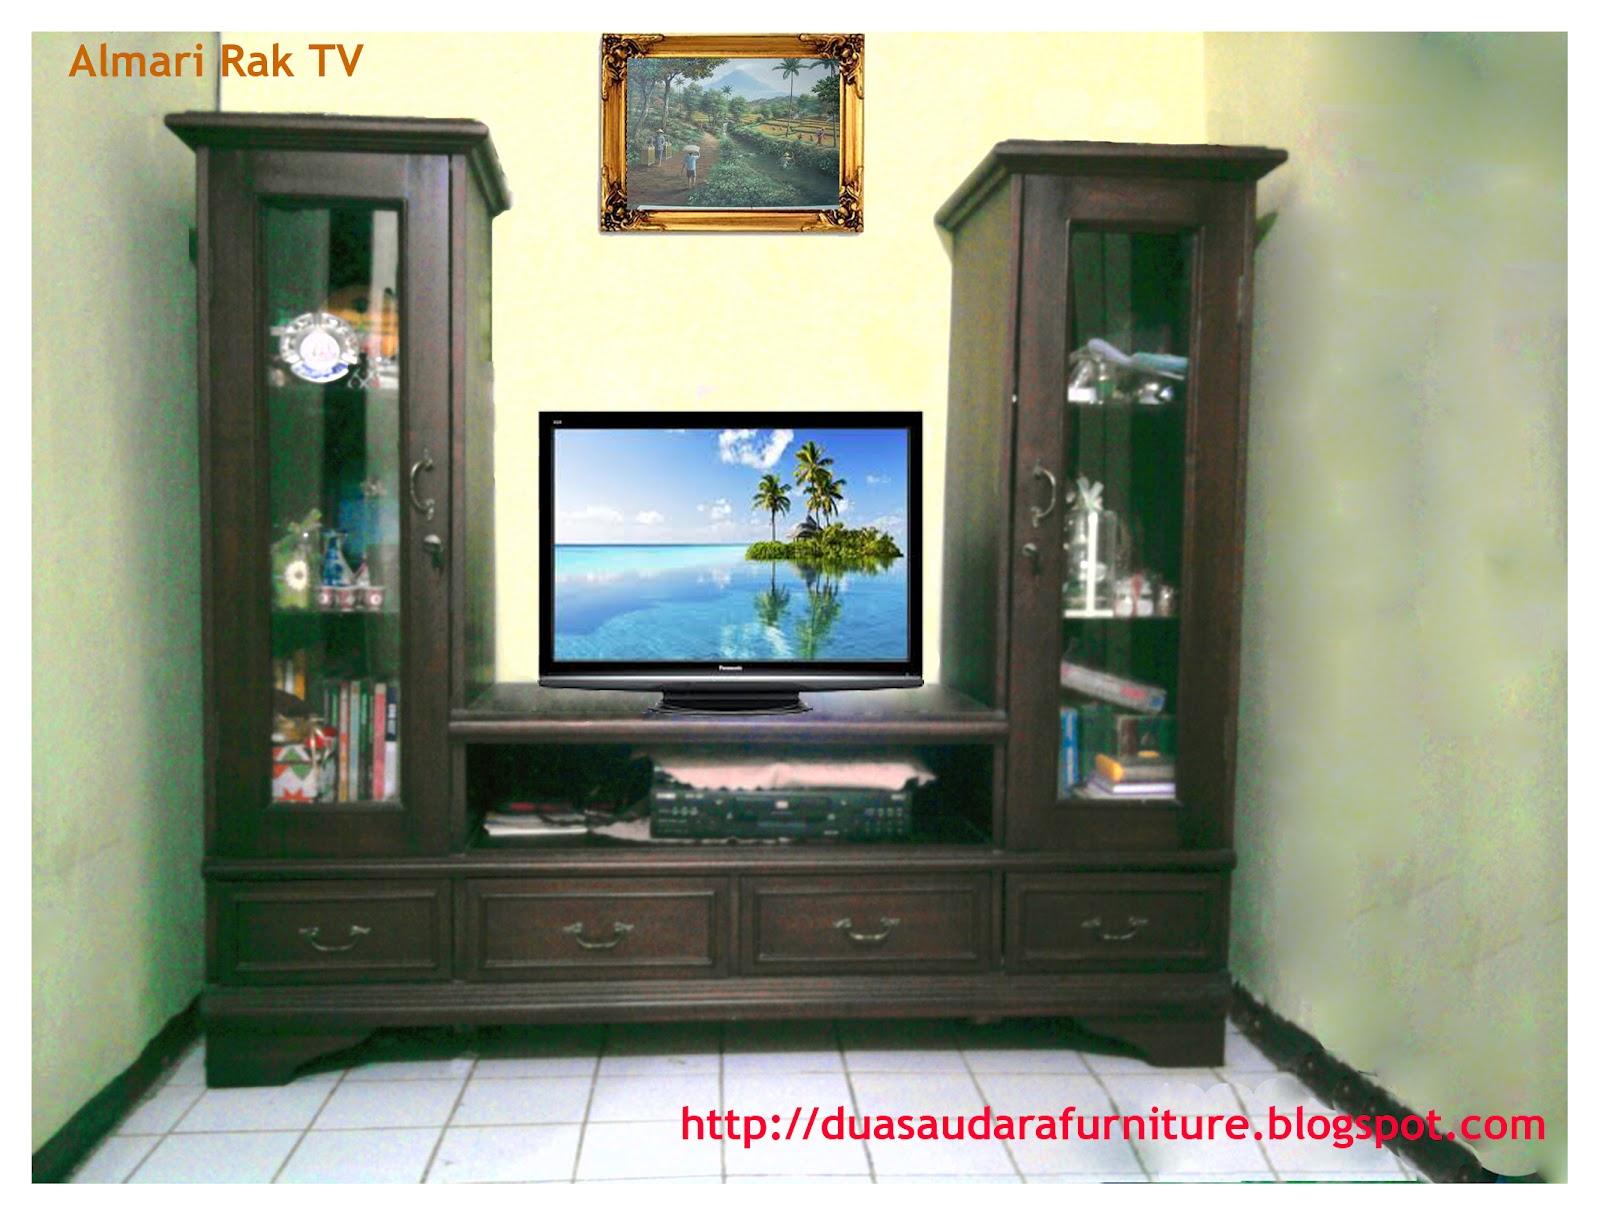 Meja tv minimalis 416 » Kumpulan Desain Meja TV Minimalis